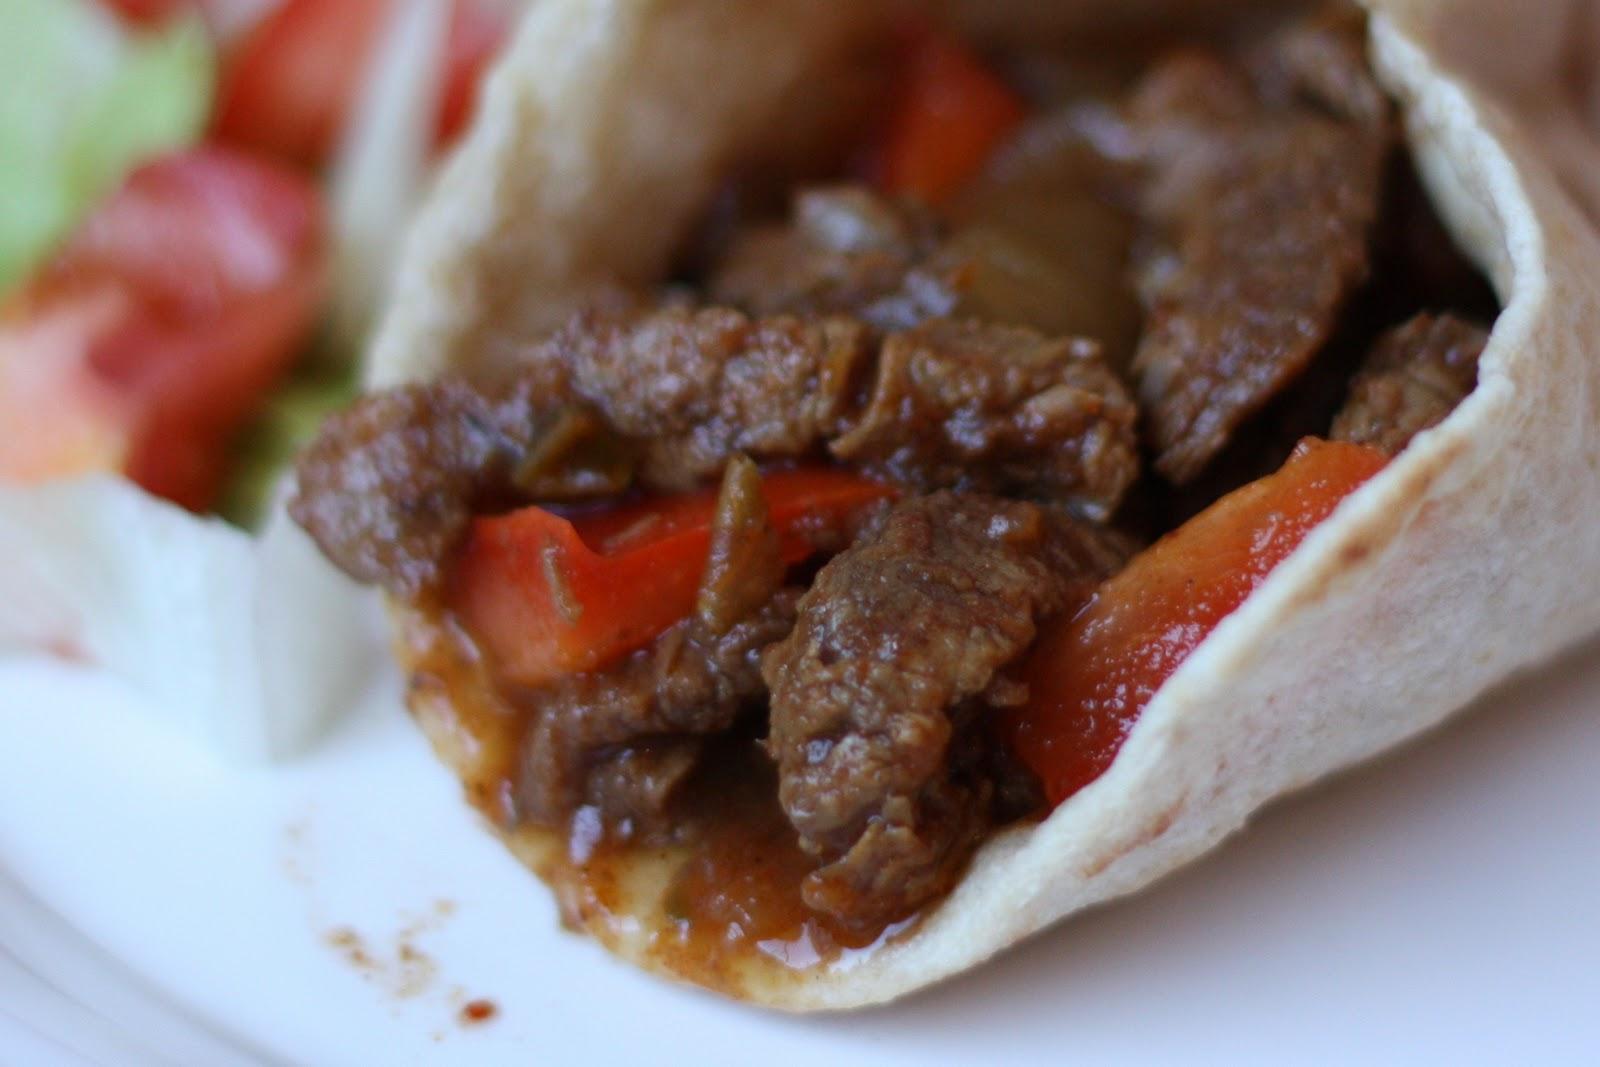 Barefeet In The Kitchen: Slow Cooked Chili Steak Fajitas